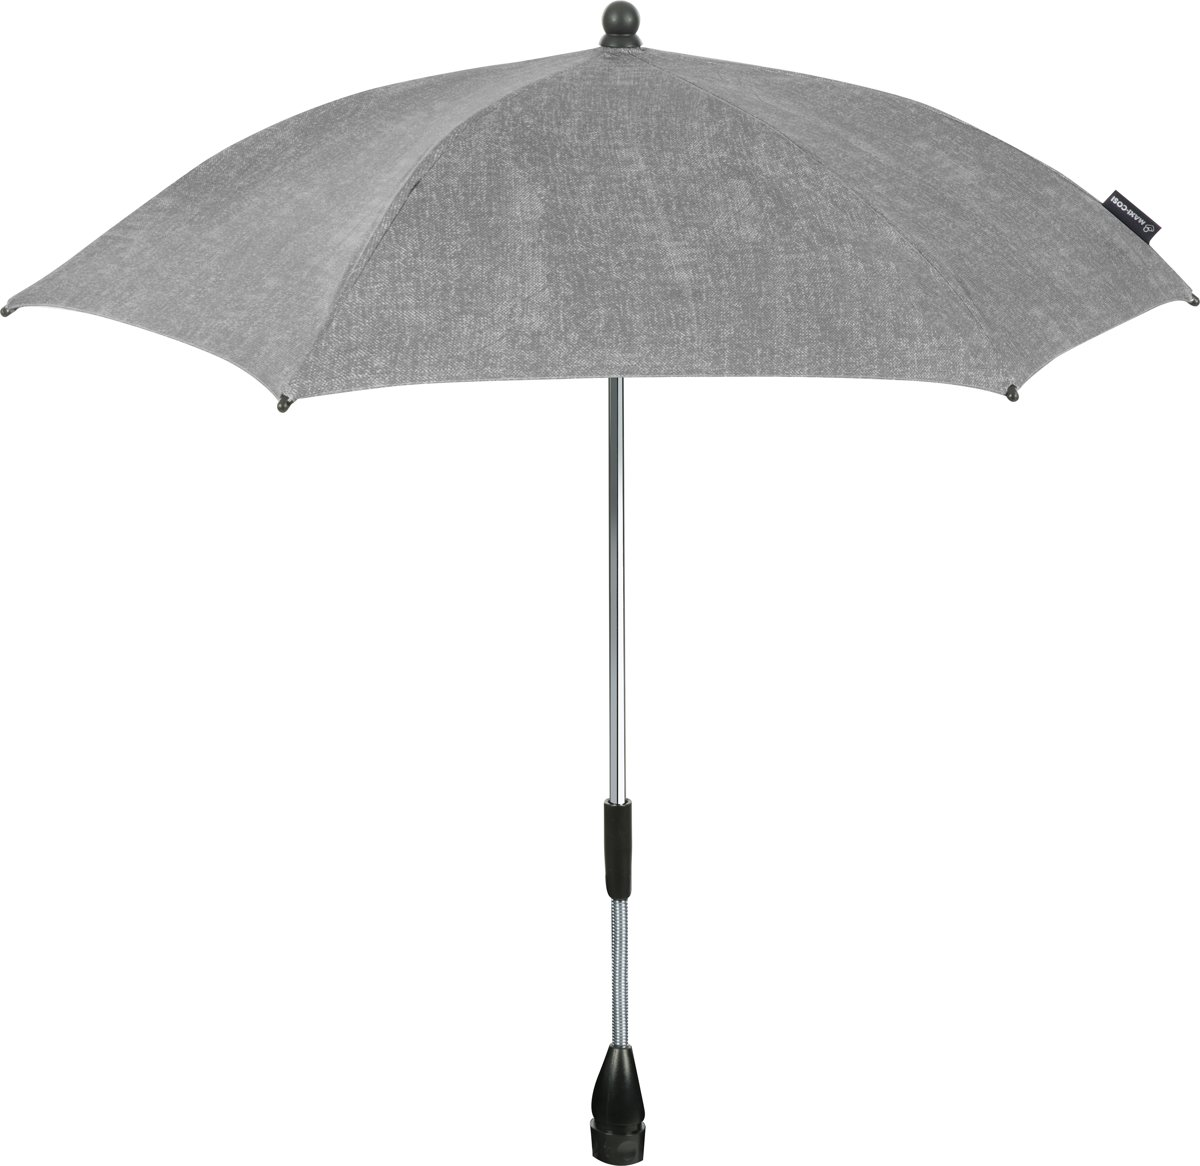 Maxi Cosi - Parasol - Nomad Grey kopen